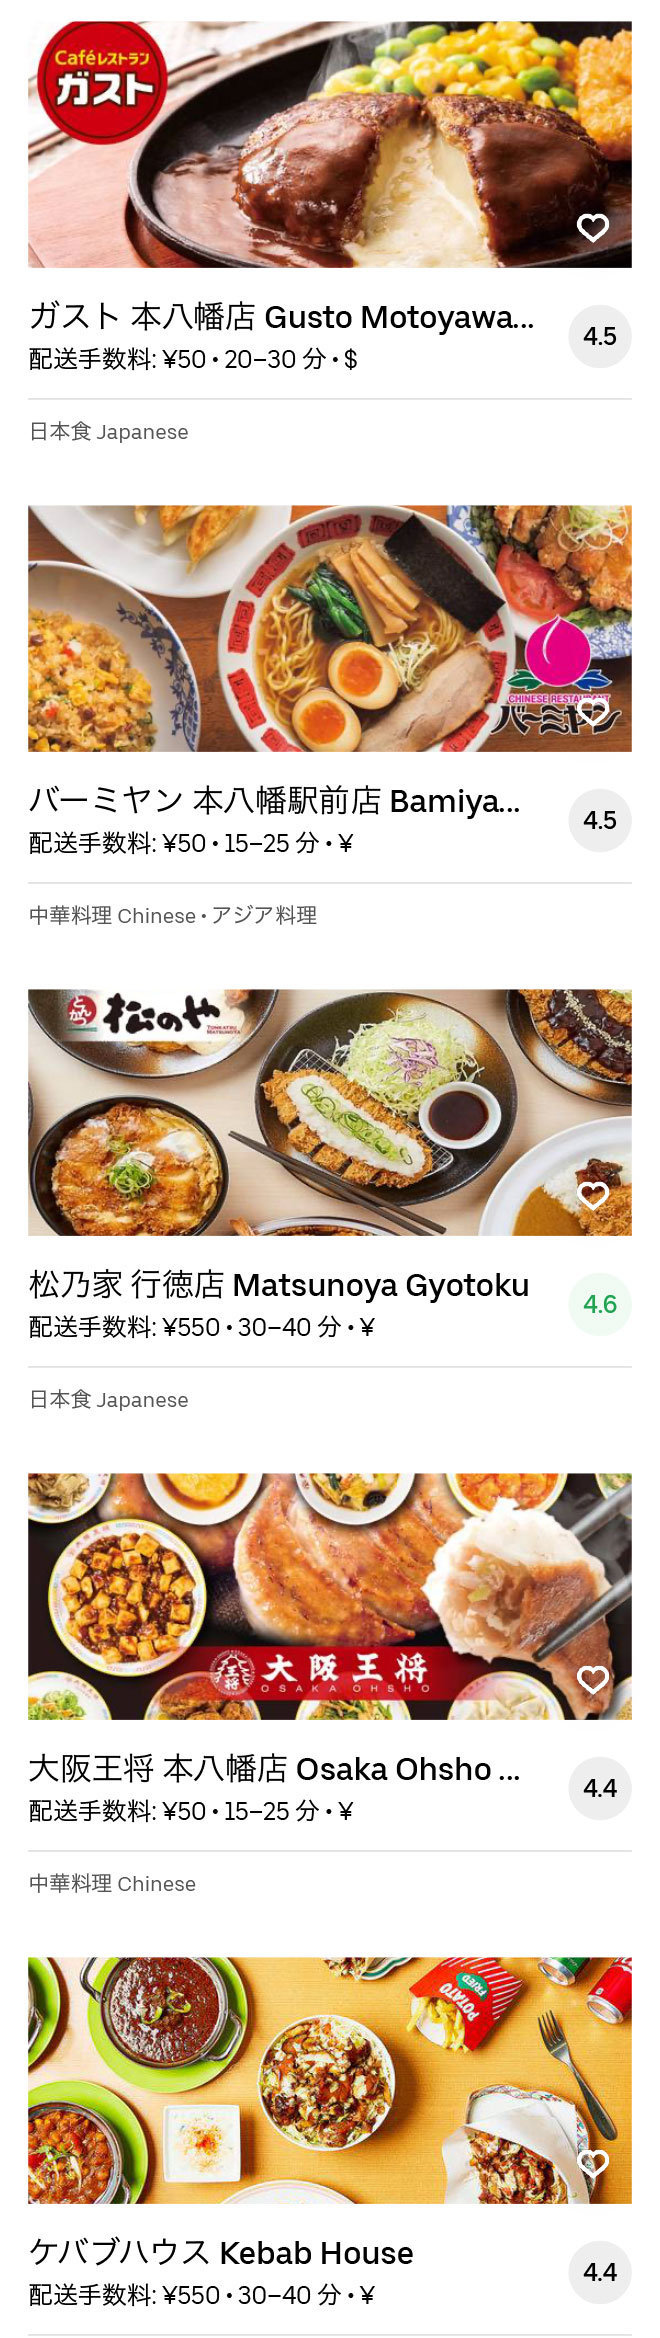 Ichikawa motoyawata menu 2004 05